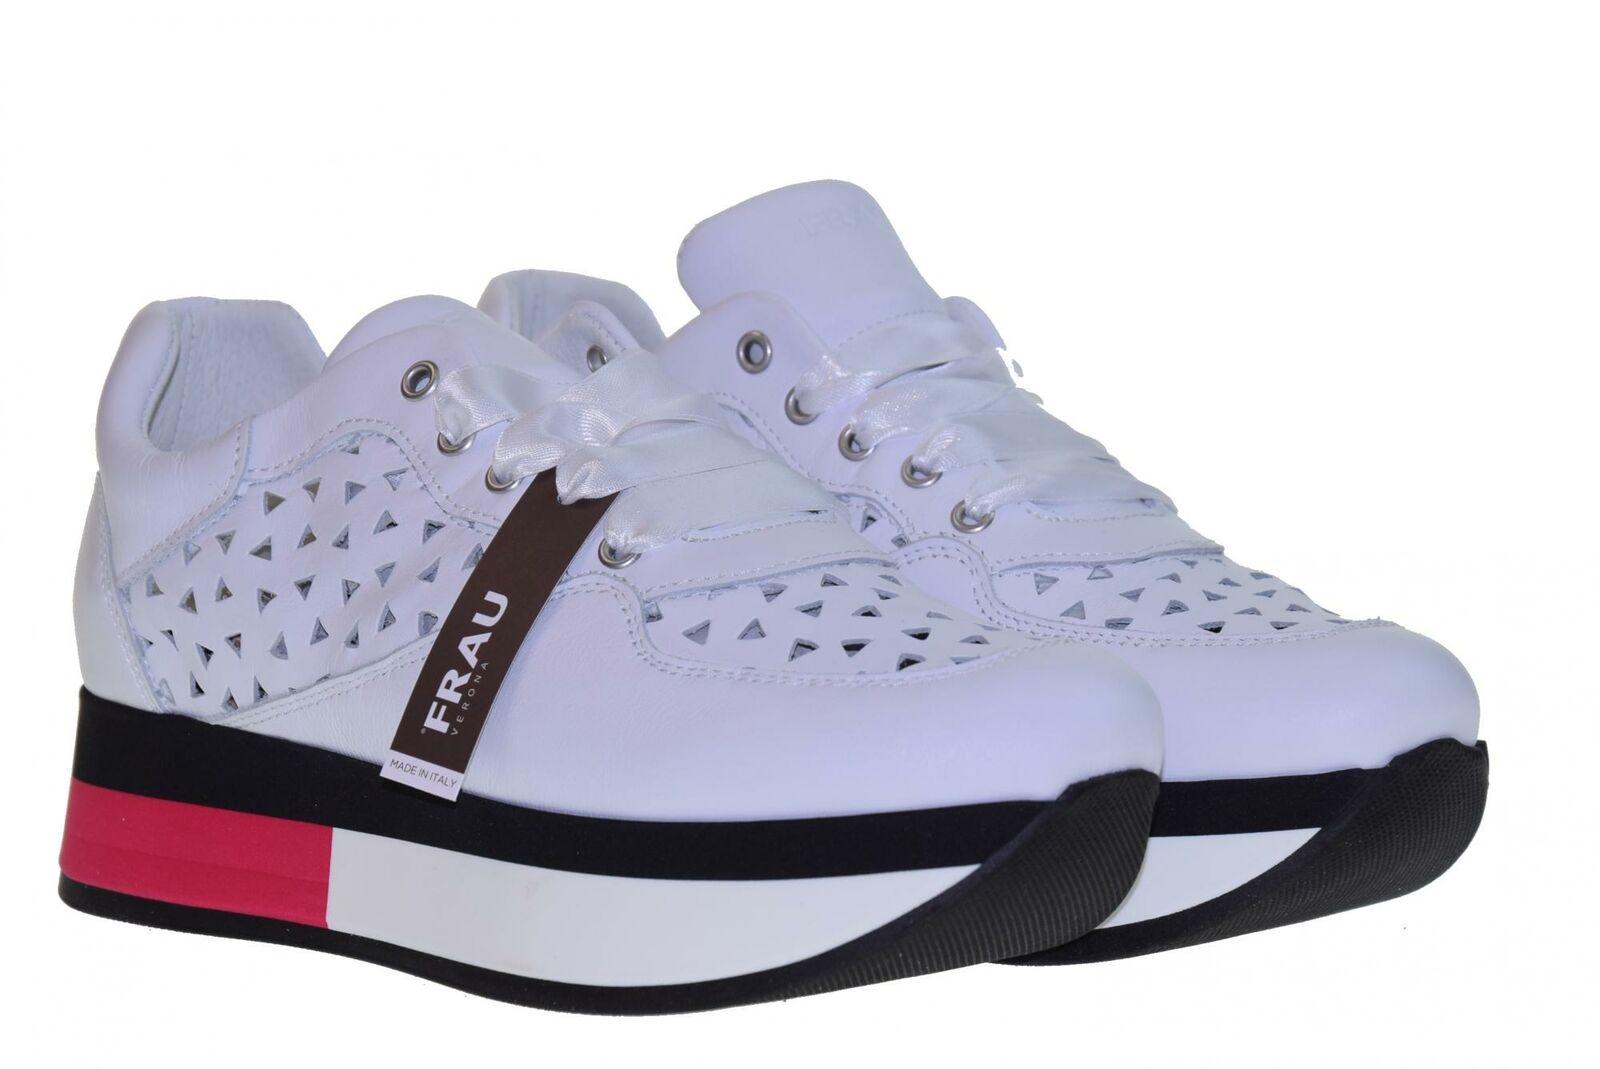 Frau P19s shoes women zapatillas bajas con silverforma 55C5 BIANCO-FUCSIA